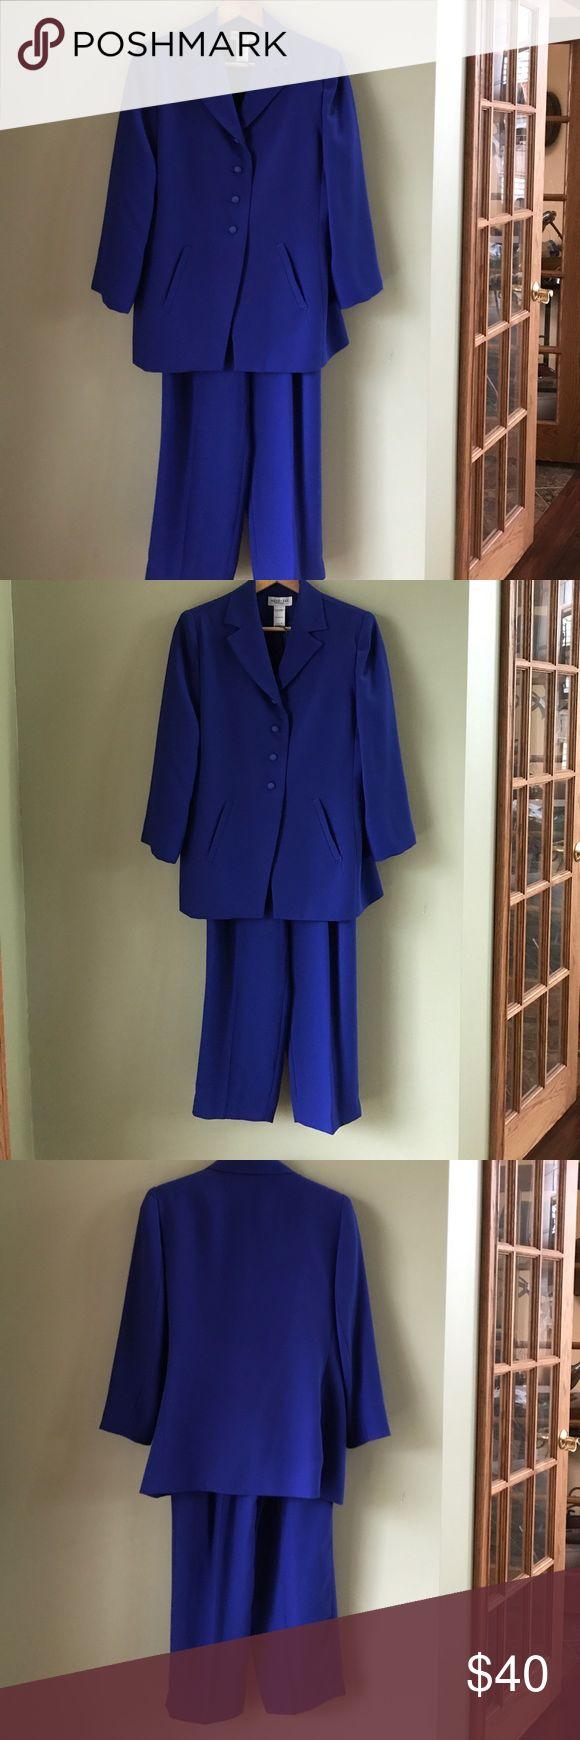 Bright blue pant suit. Jacket and pants Beautiful bright blue pant suit. Jacket and pants in petite size 8. Four button jacket. Terrific condition Henry Lee Petites Other